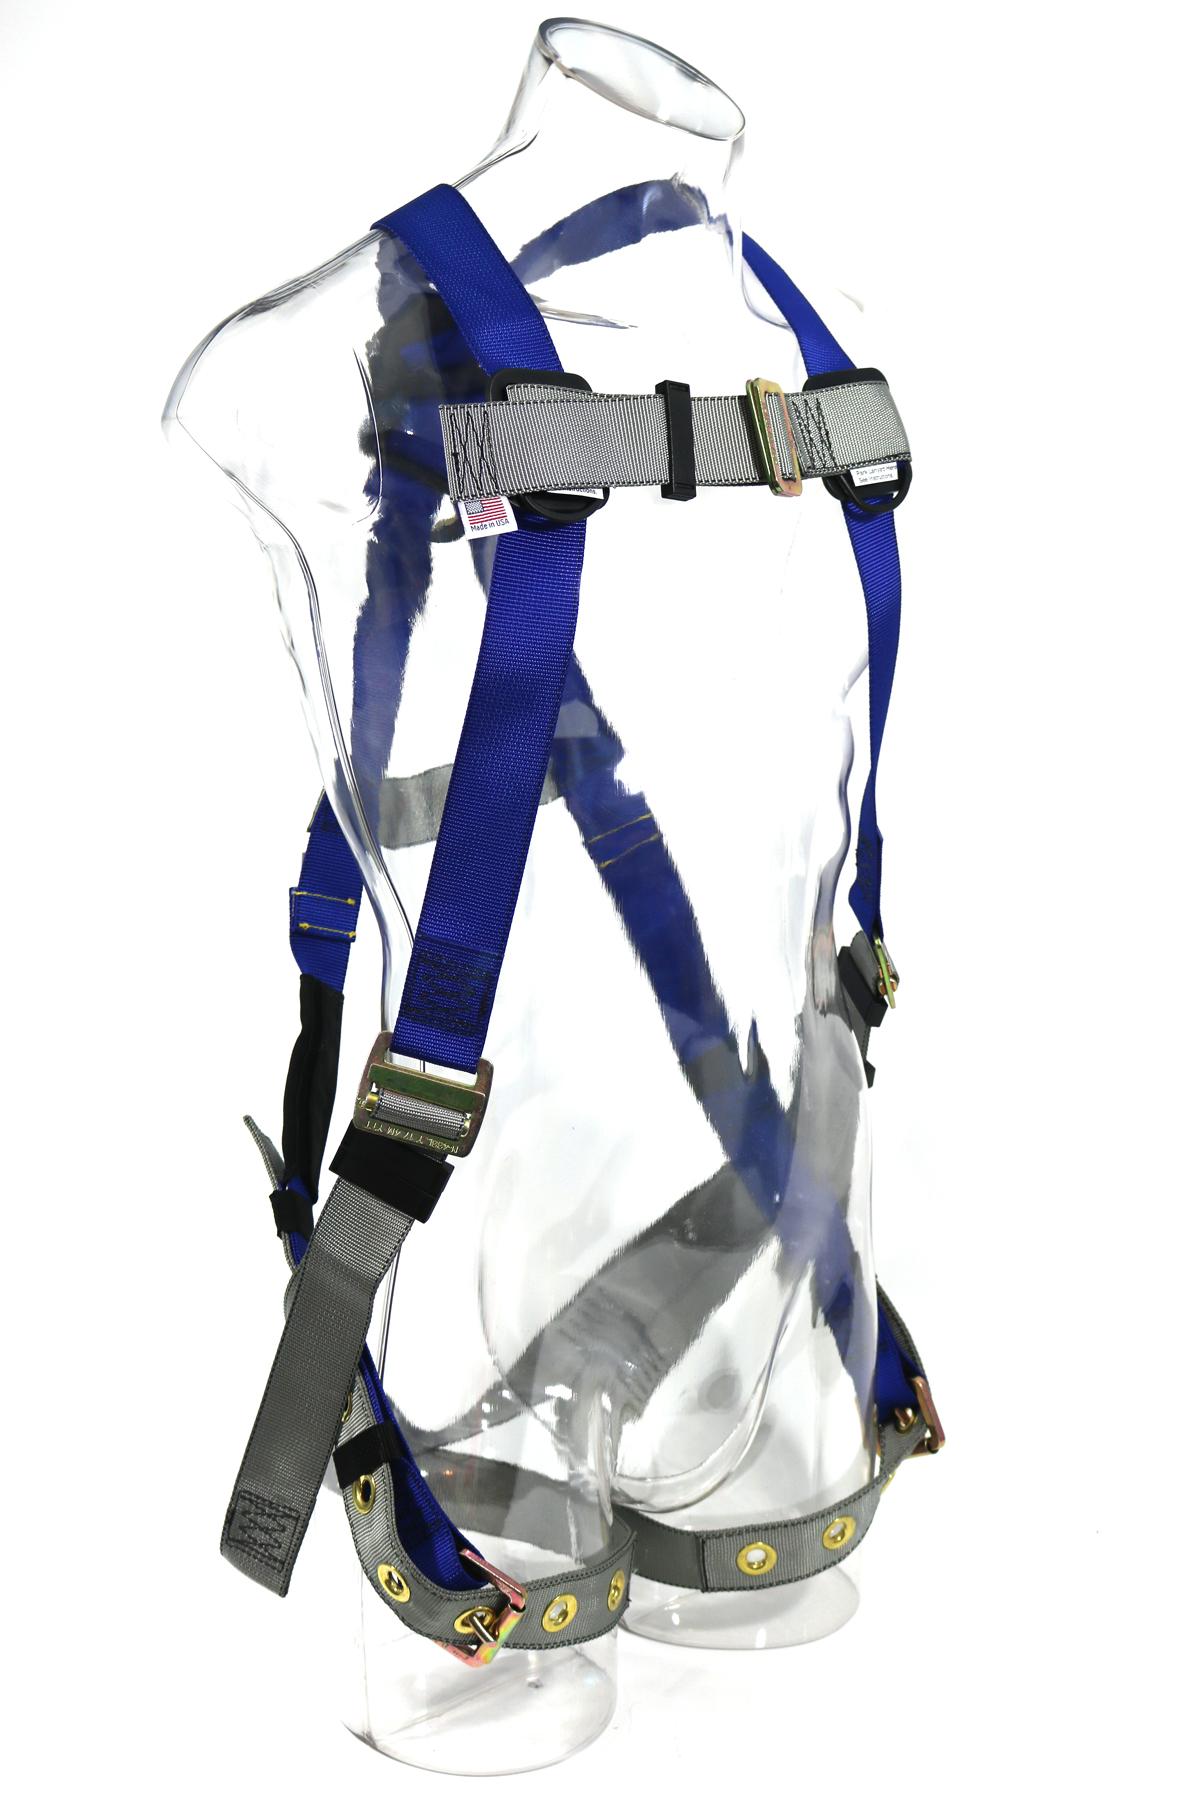 600100_2 harnesses wrs fall protection systems and osha training webb